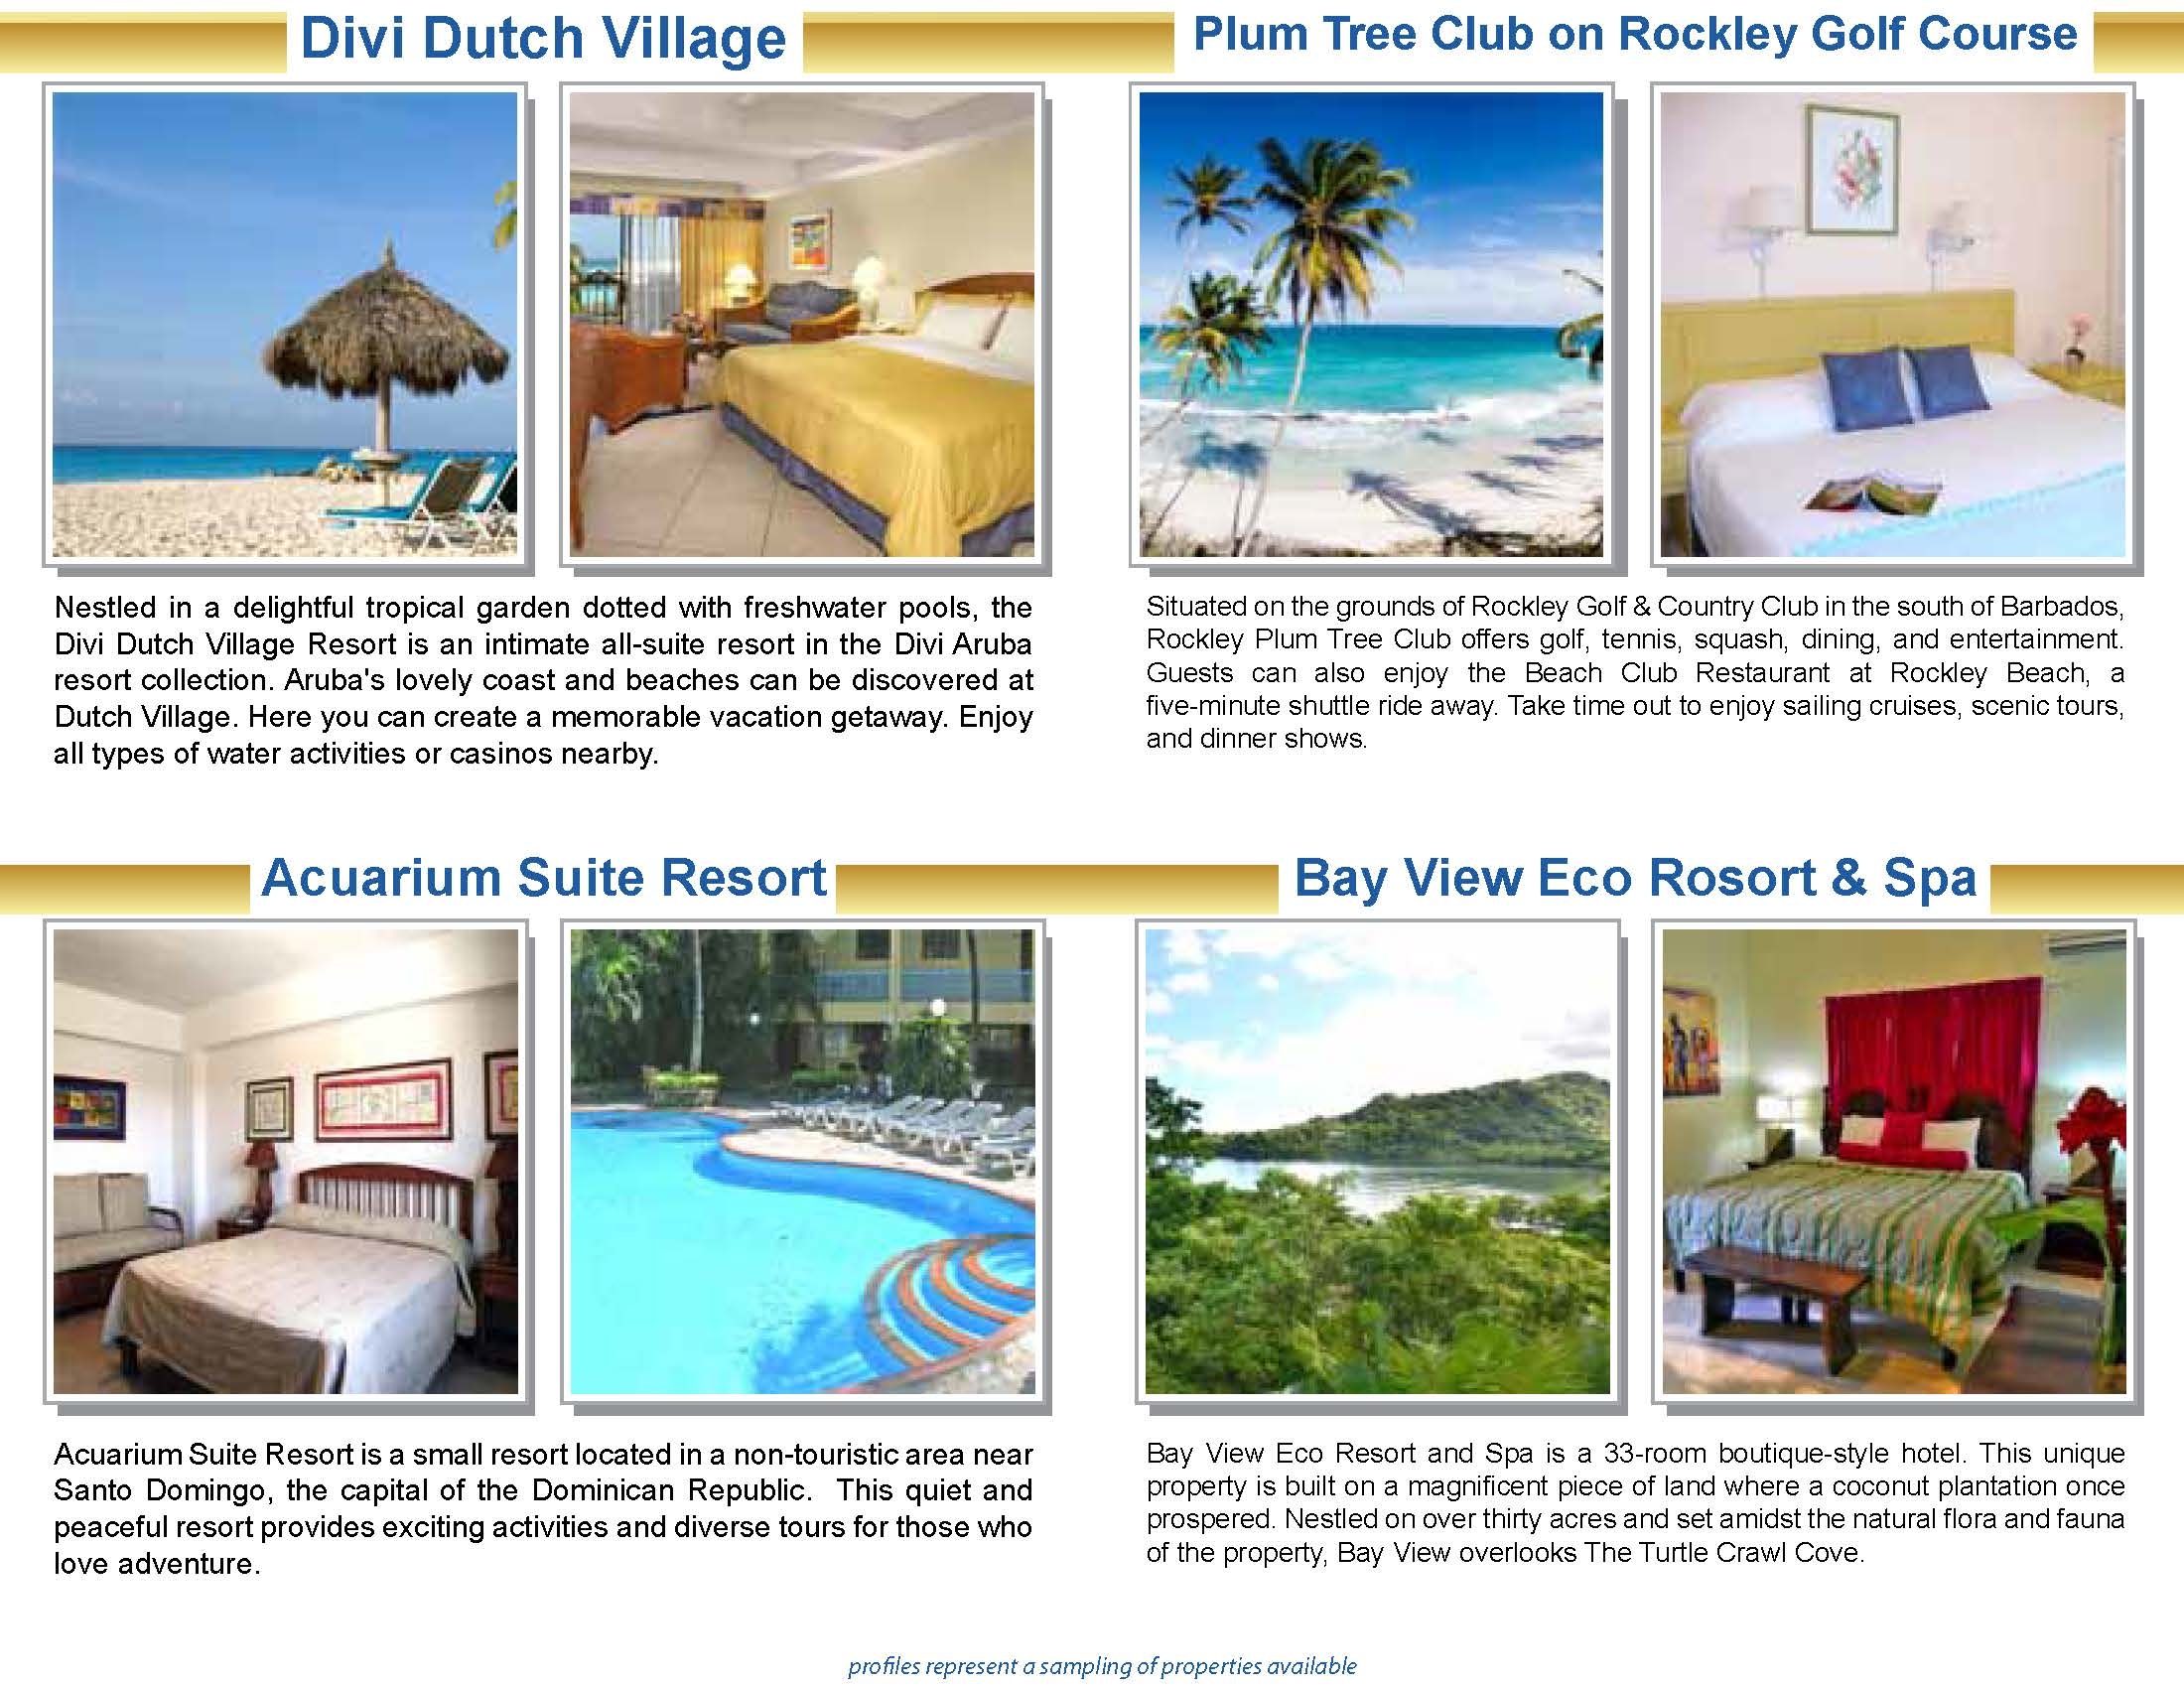 SG Vacation Club - Basic SG Membersh